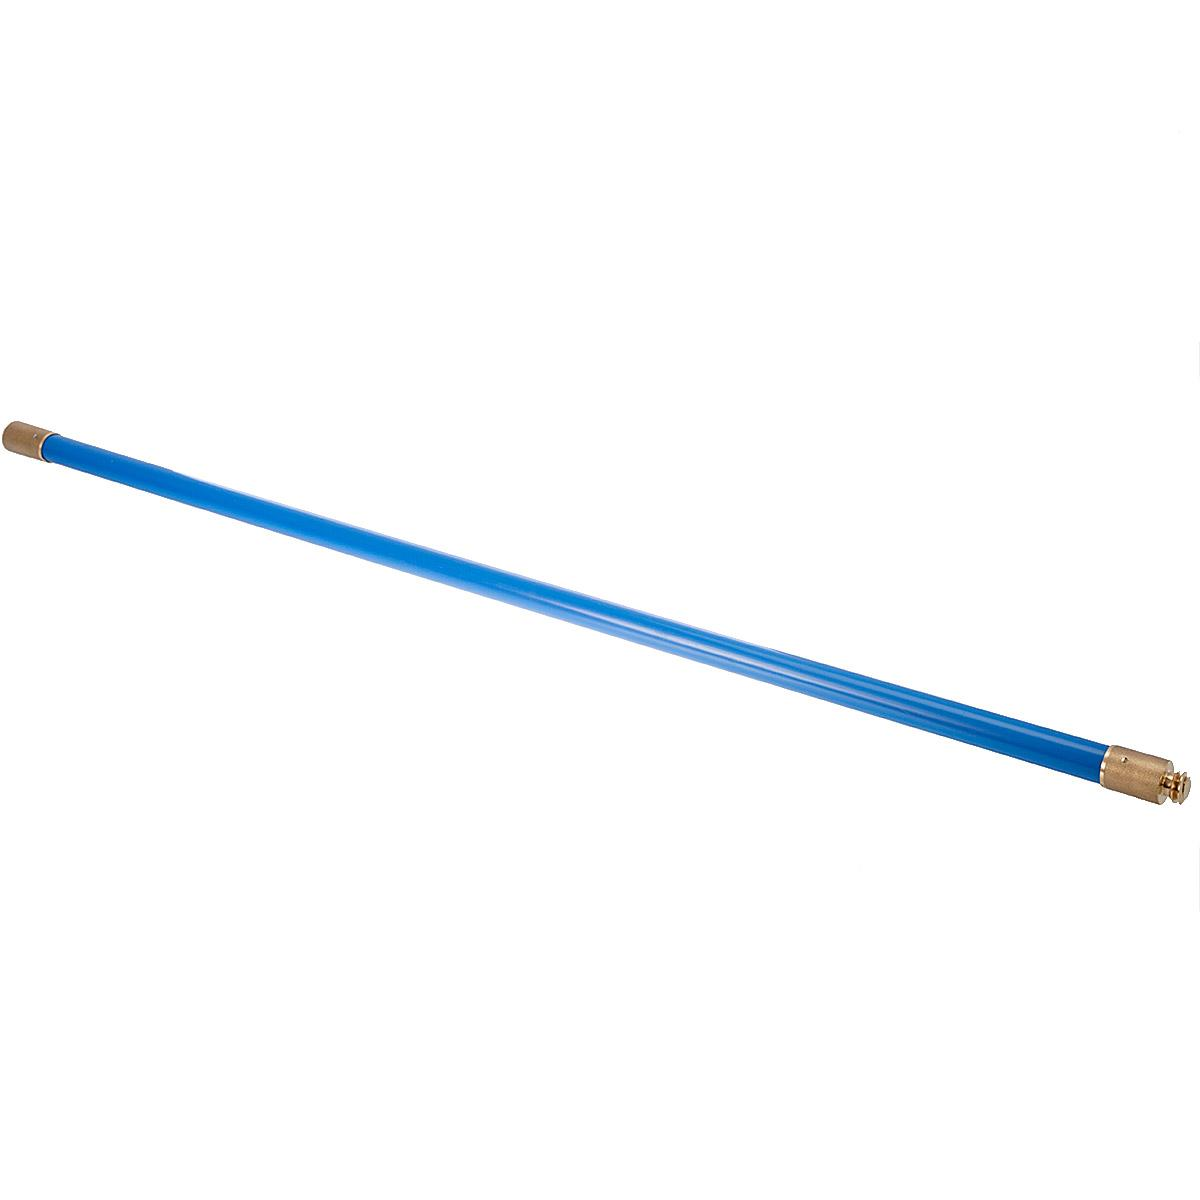 Bailey 1601 Universal Blue Polypropylene Rod 7/8 x 3ft lowest price